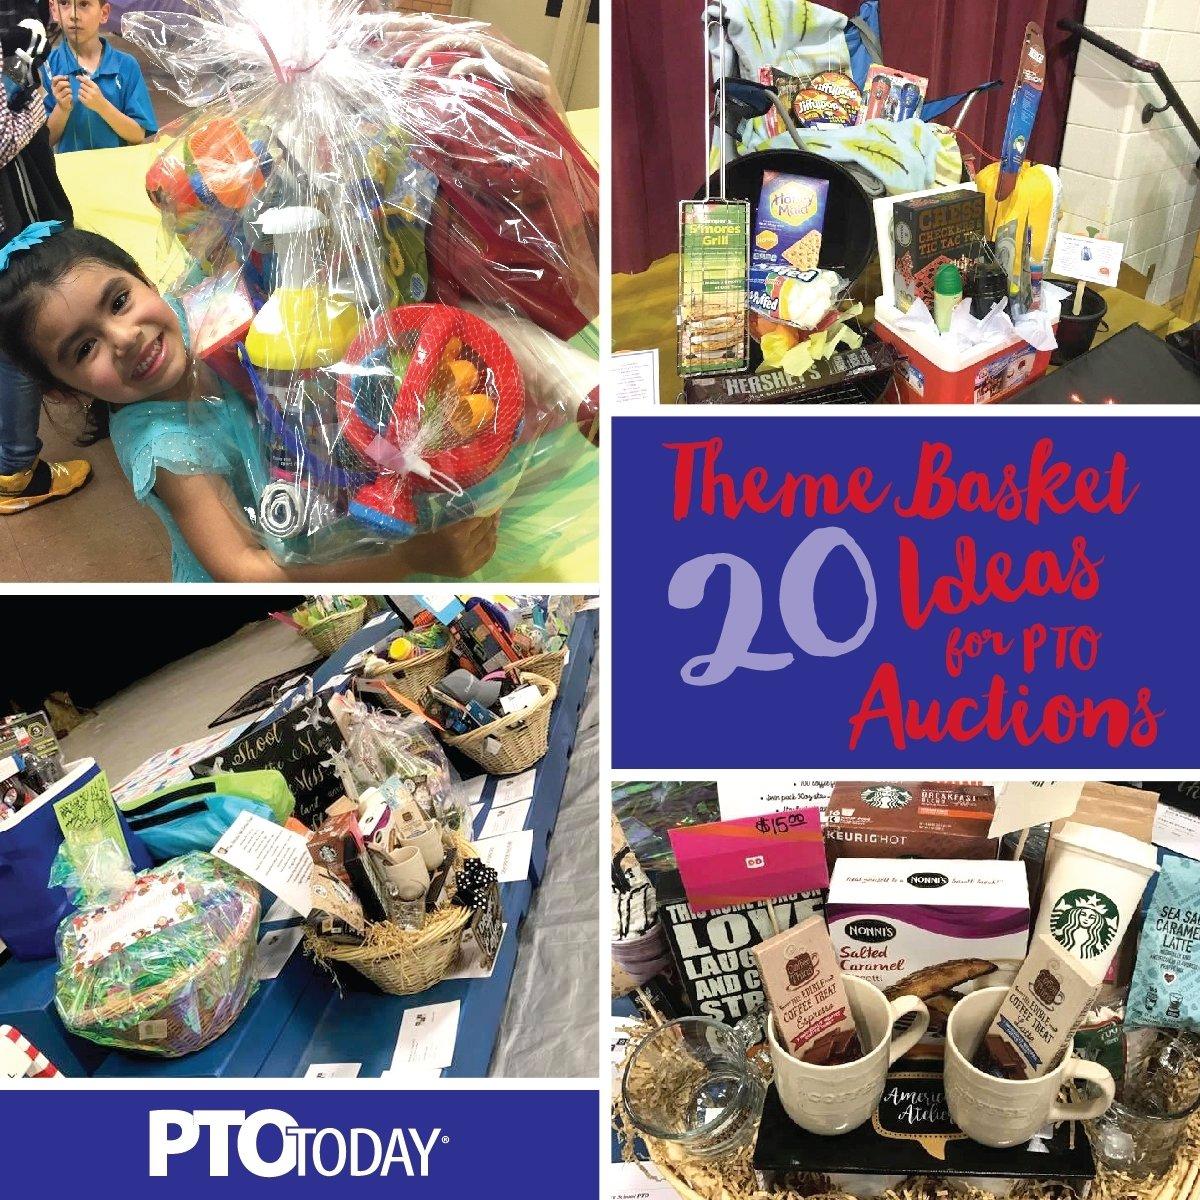 10 Cute Theme Basket Ideas For Silent Auction 20 ideas for theme baskets for ptos and ptas pto today 3 2021